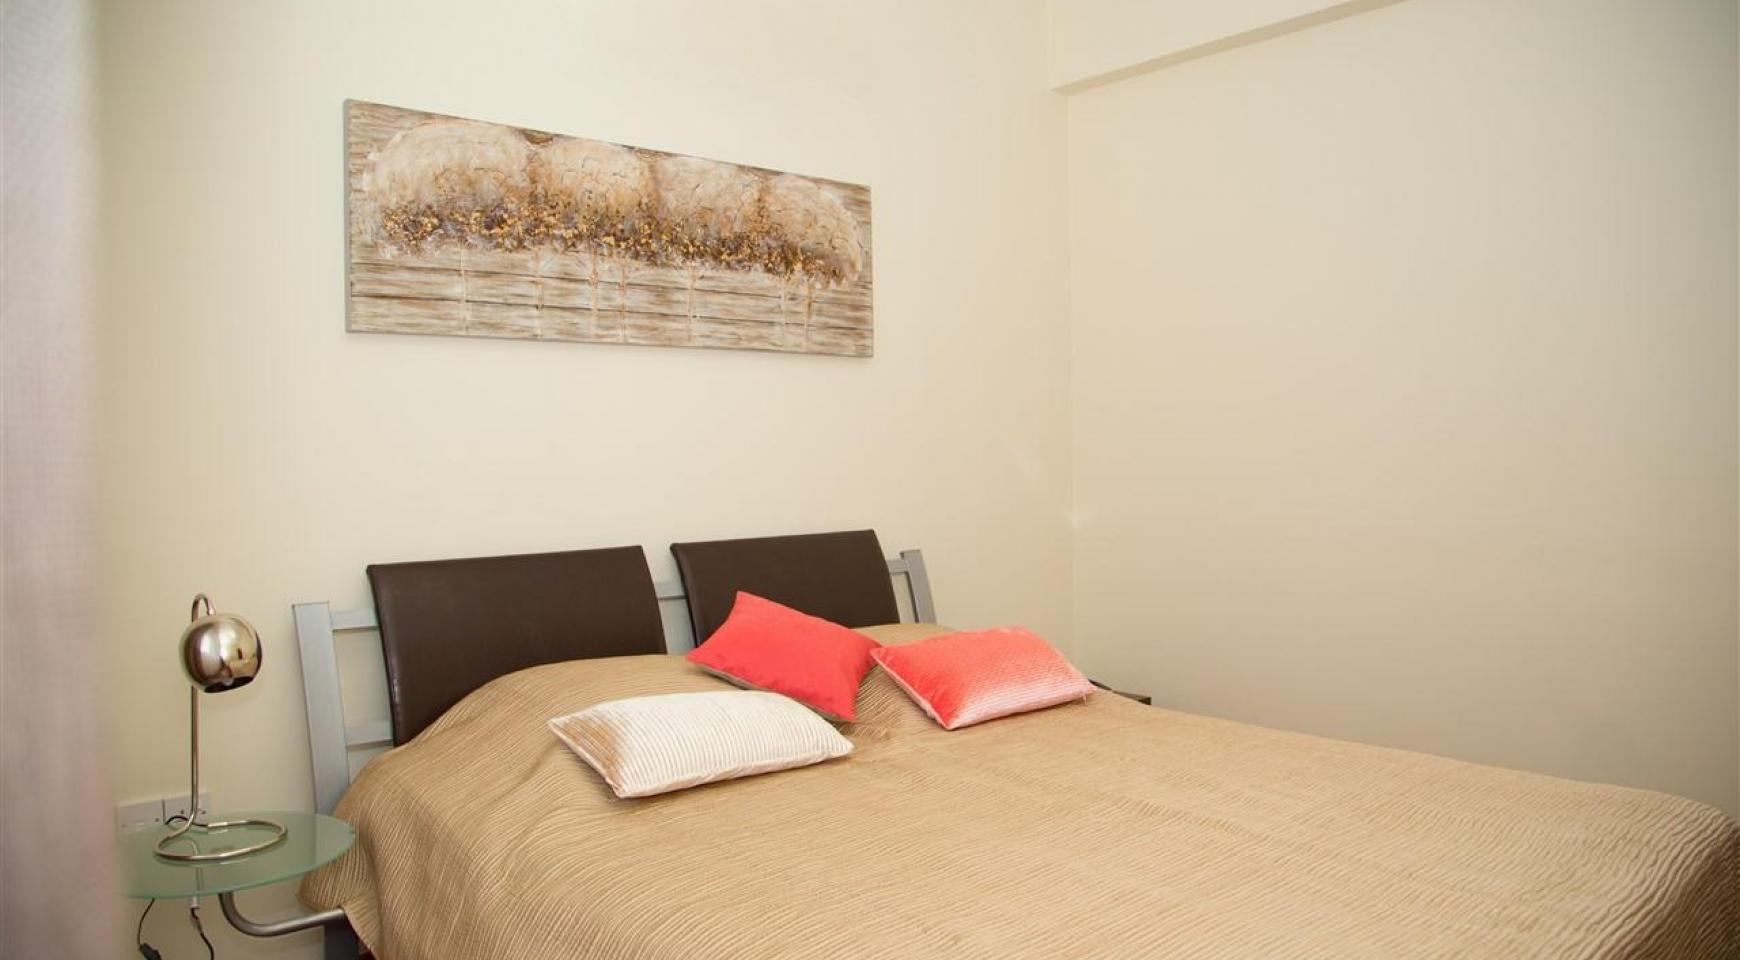 Luxury 2 Bedroom Apartment Mesogios Iris 304 in the Tourist area near the Beach - 18